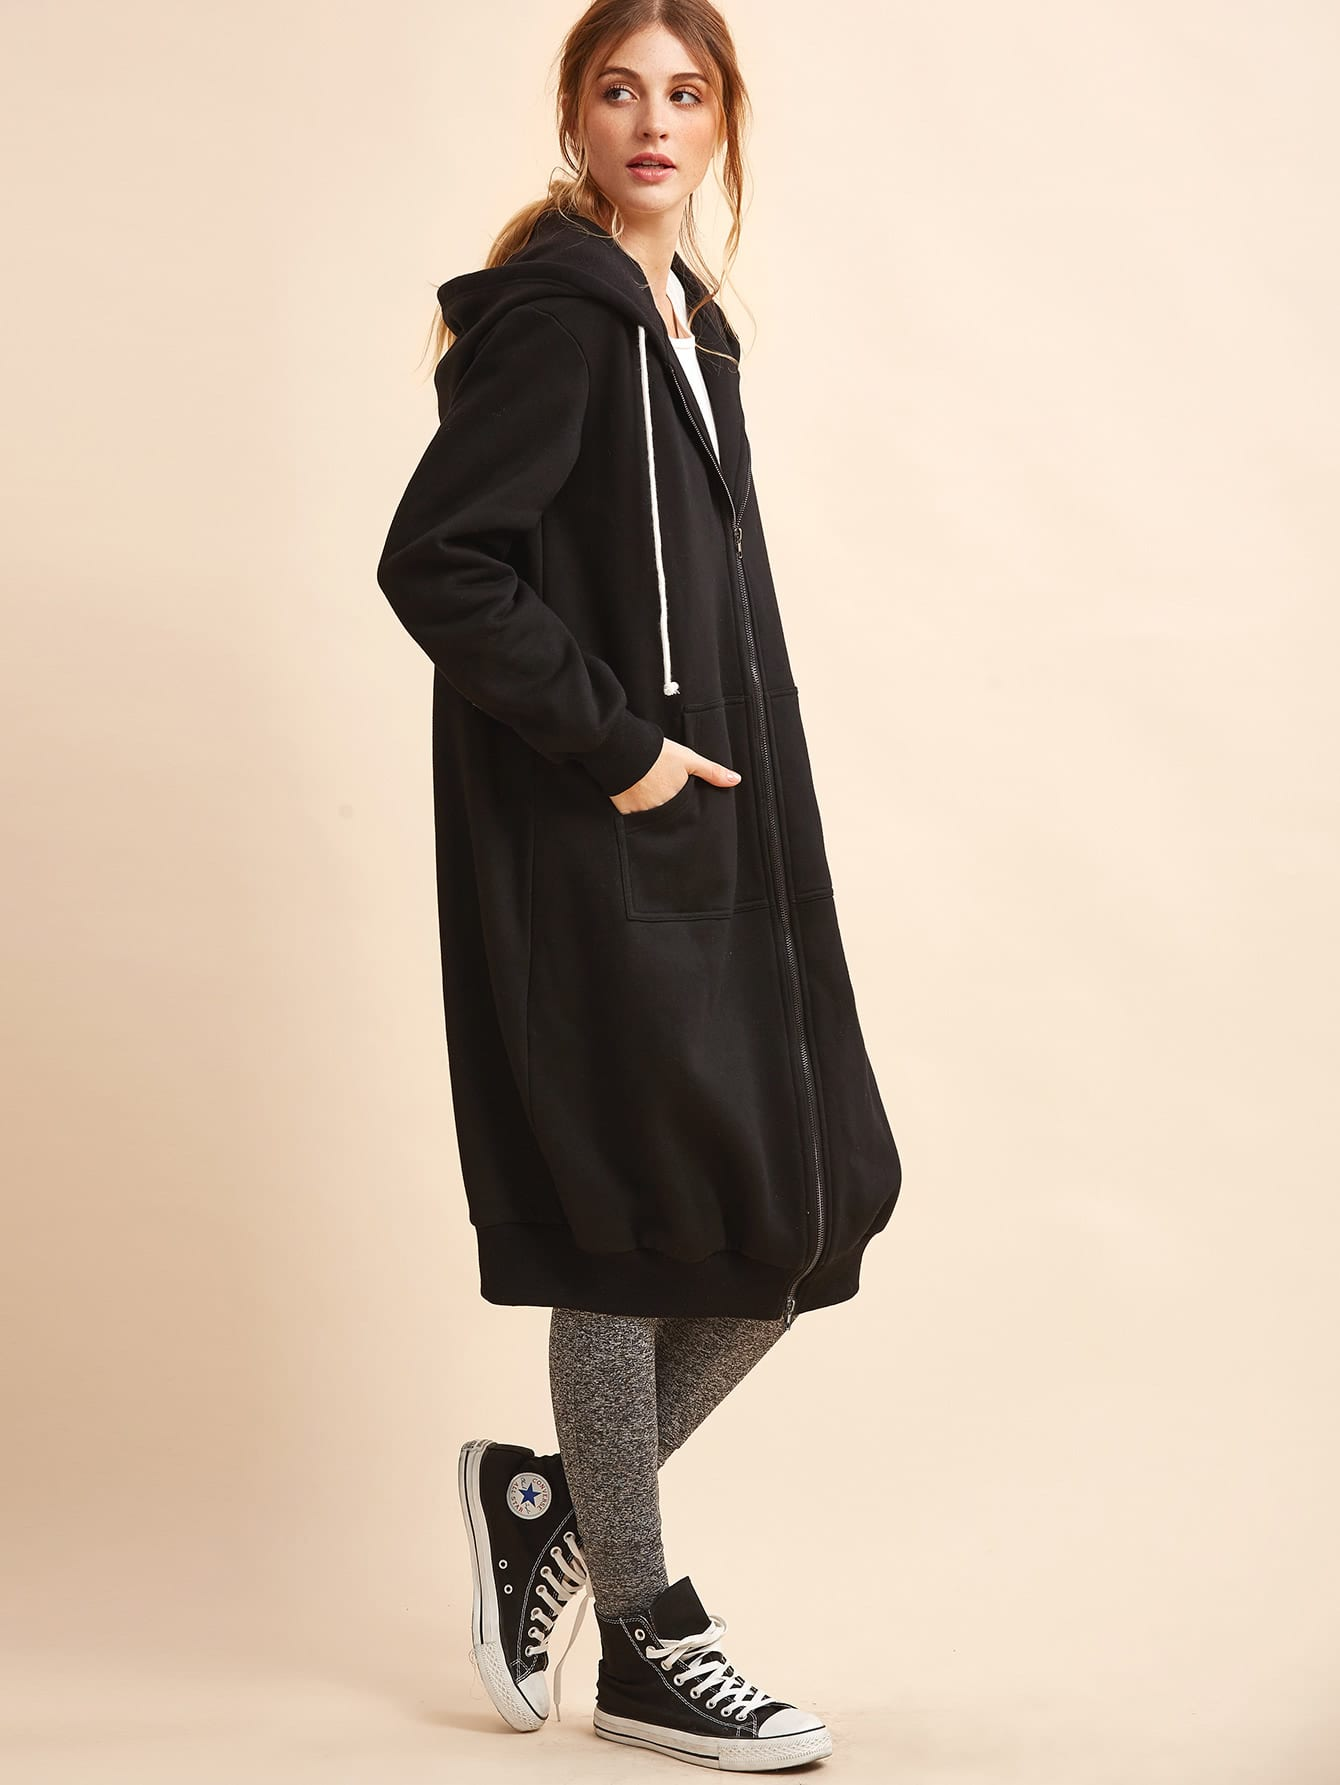 Black Hooded Zipper Long Sweatshirt With Pockets